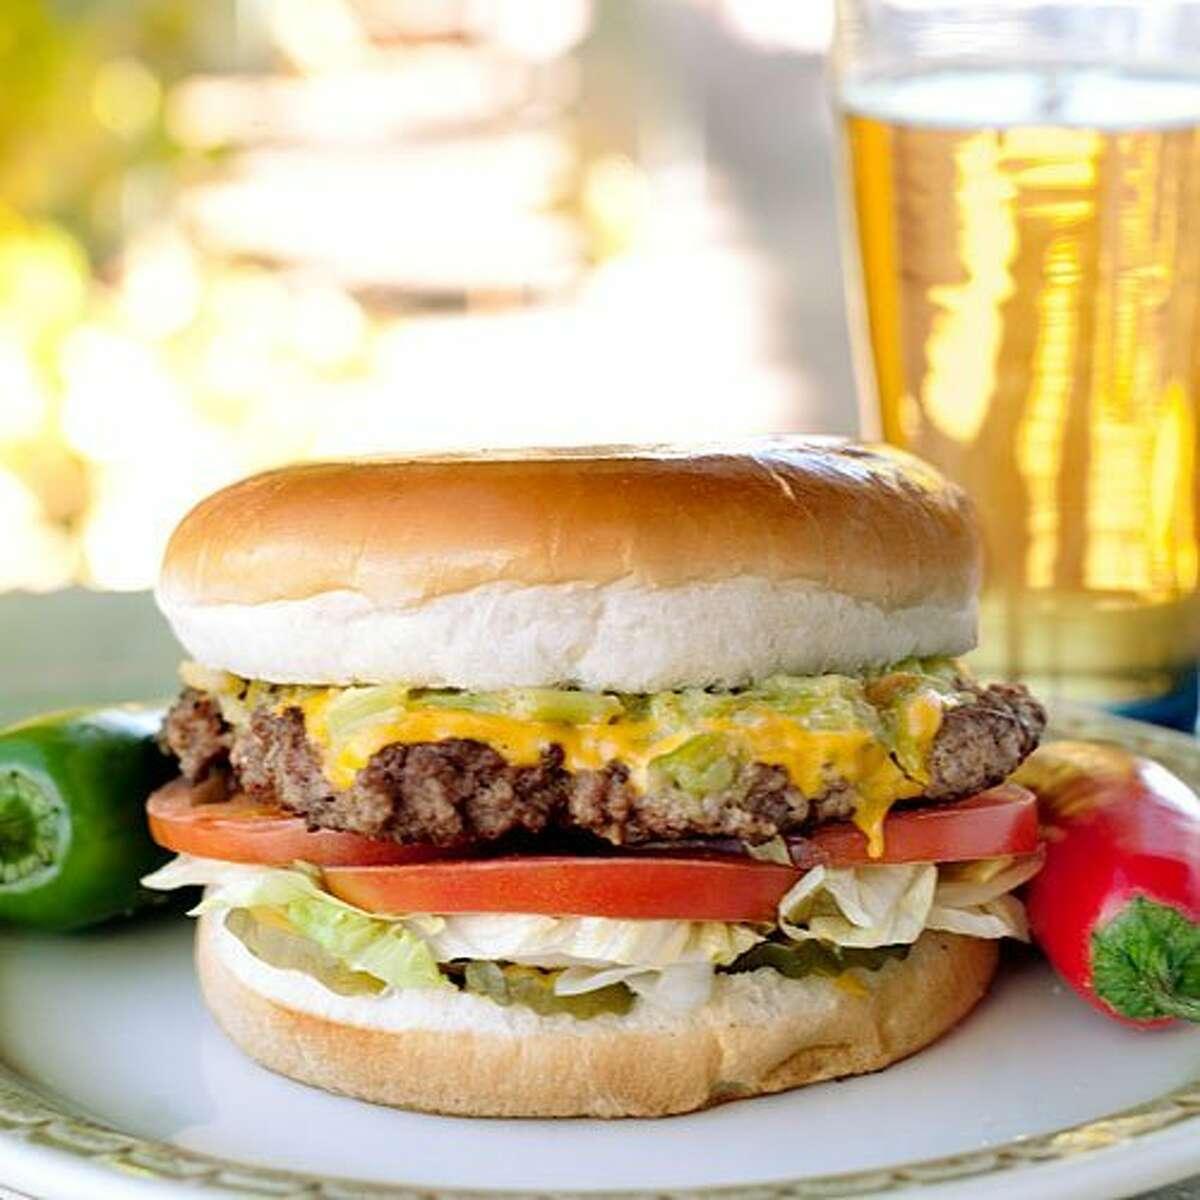 Buckhorn Tavern in San Antonio, TX serves up a green-chile burger as big as a big rig's hubcap.